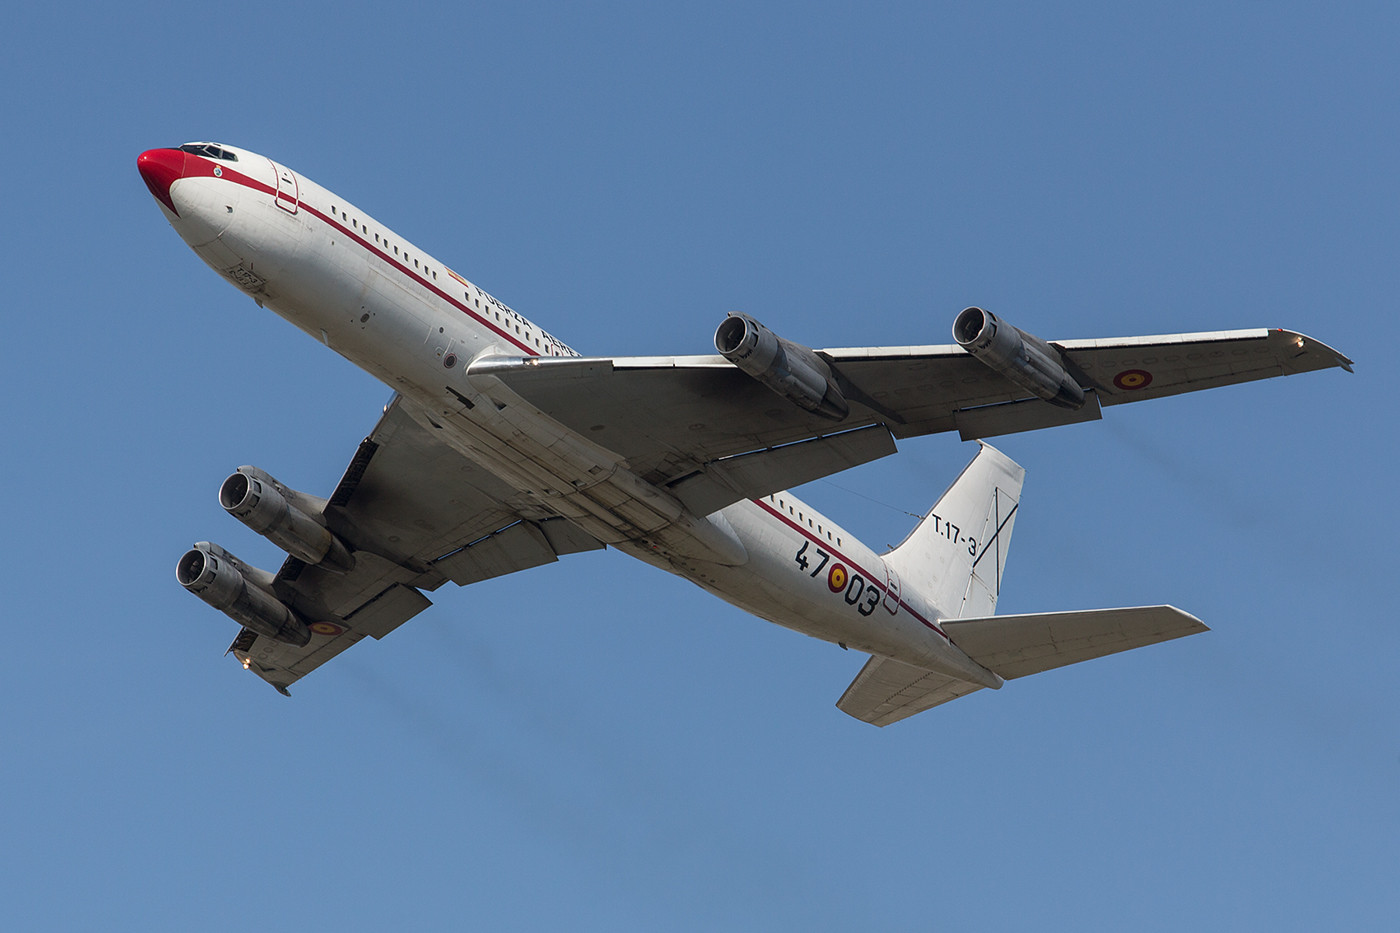 RMS 31.08.2015; Boeing 707-368C; T.17-3; Grupo 47 Madrid-Torrejon (Spanien)